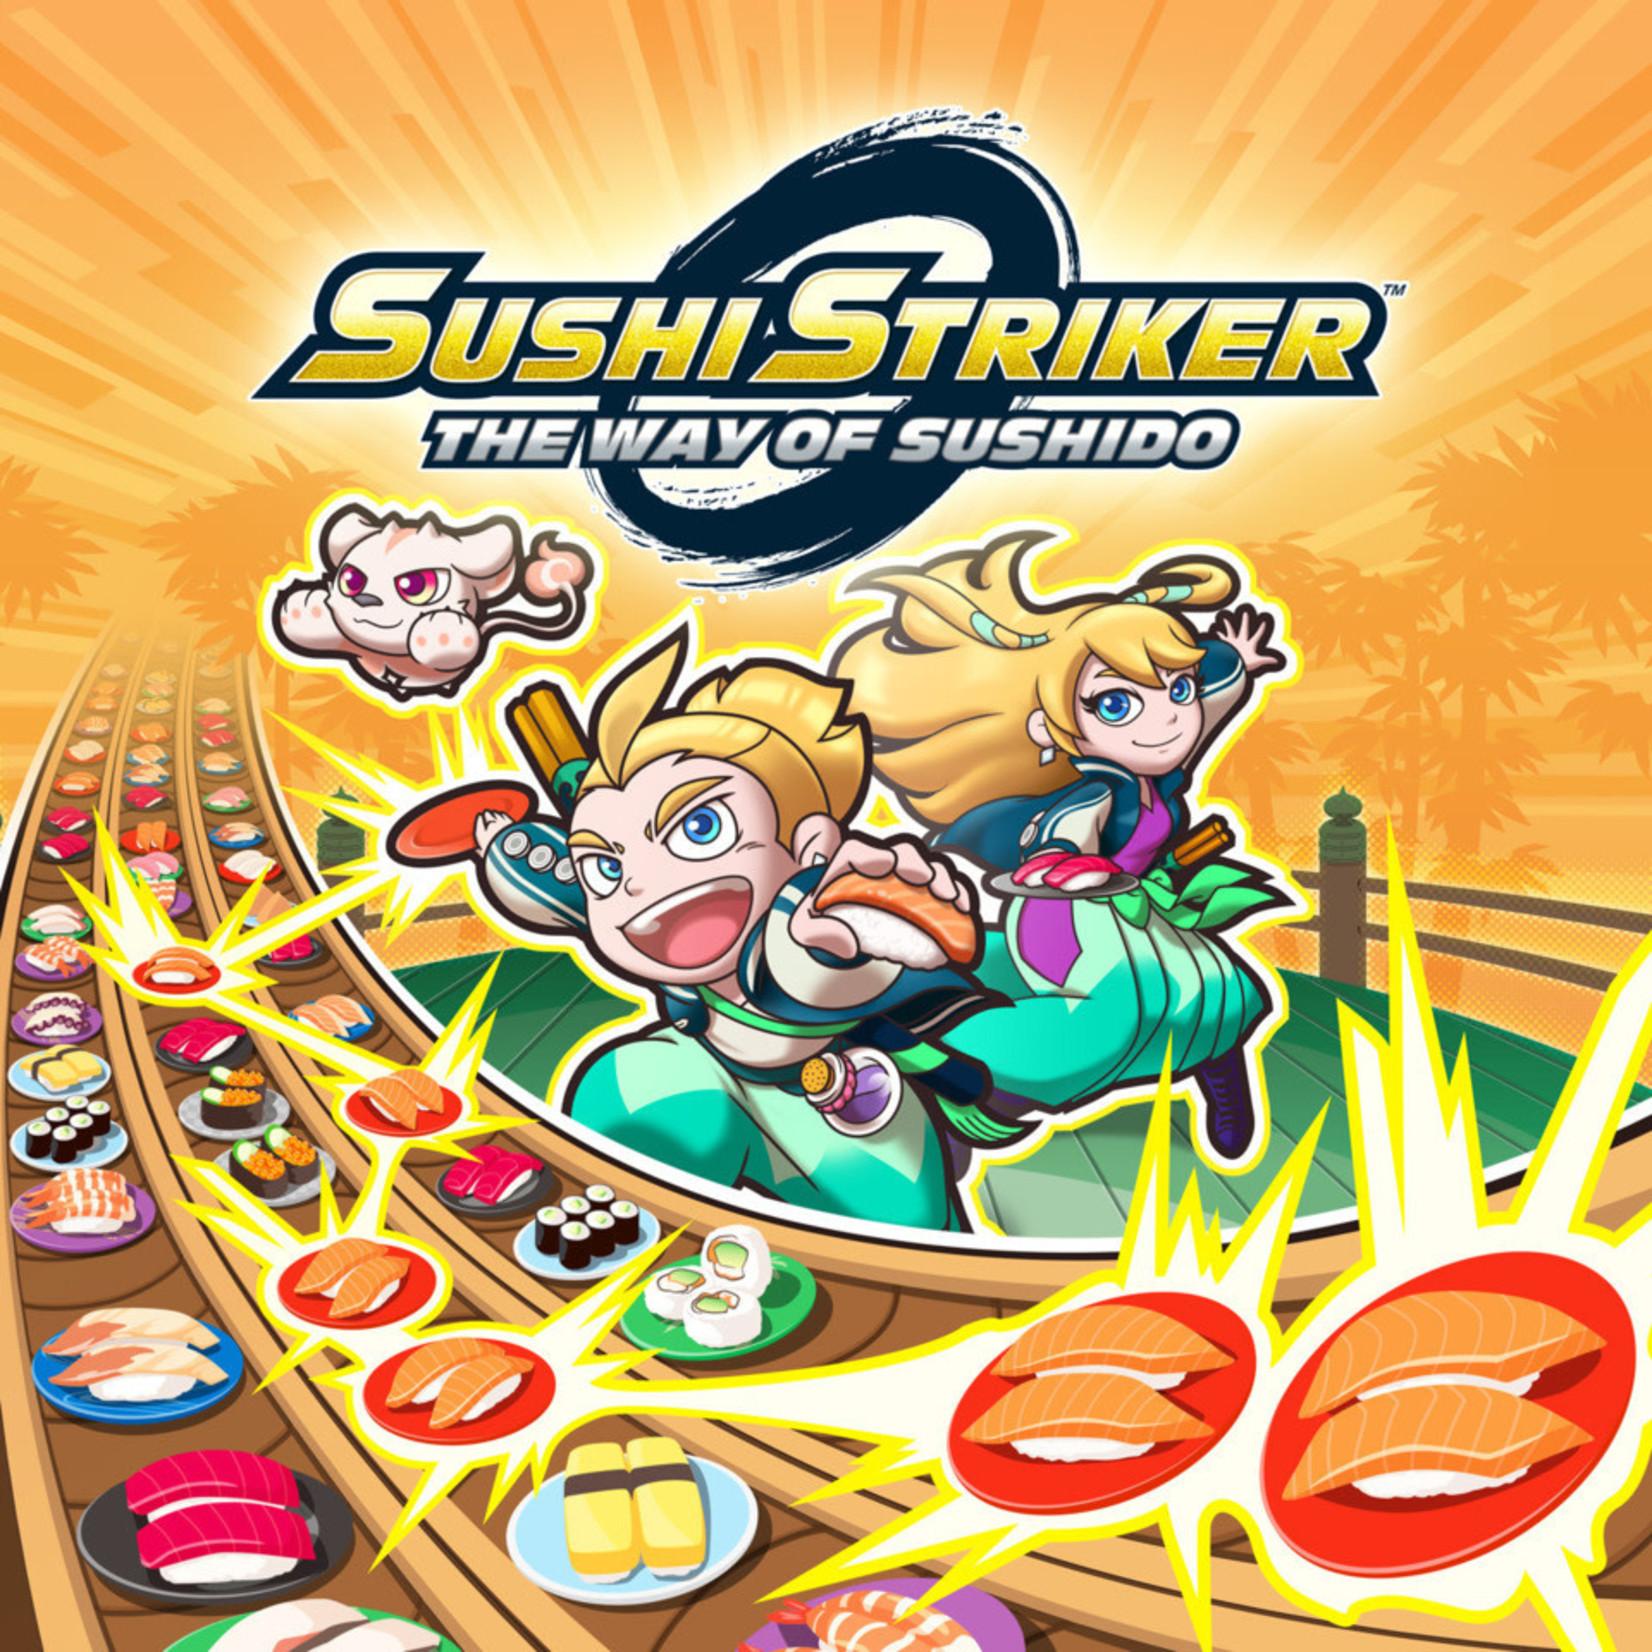 3DS-Sushi Striker: The Way of Sushido